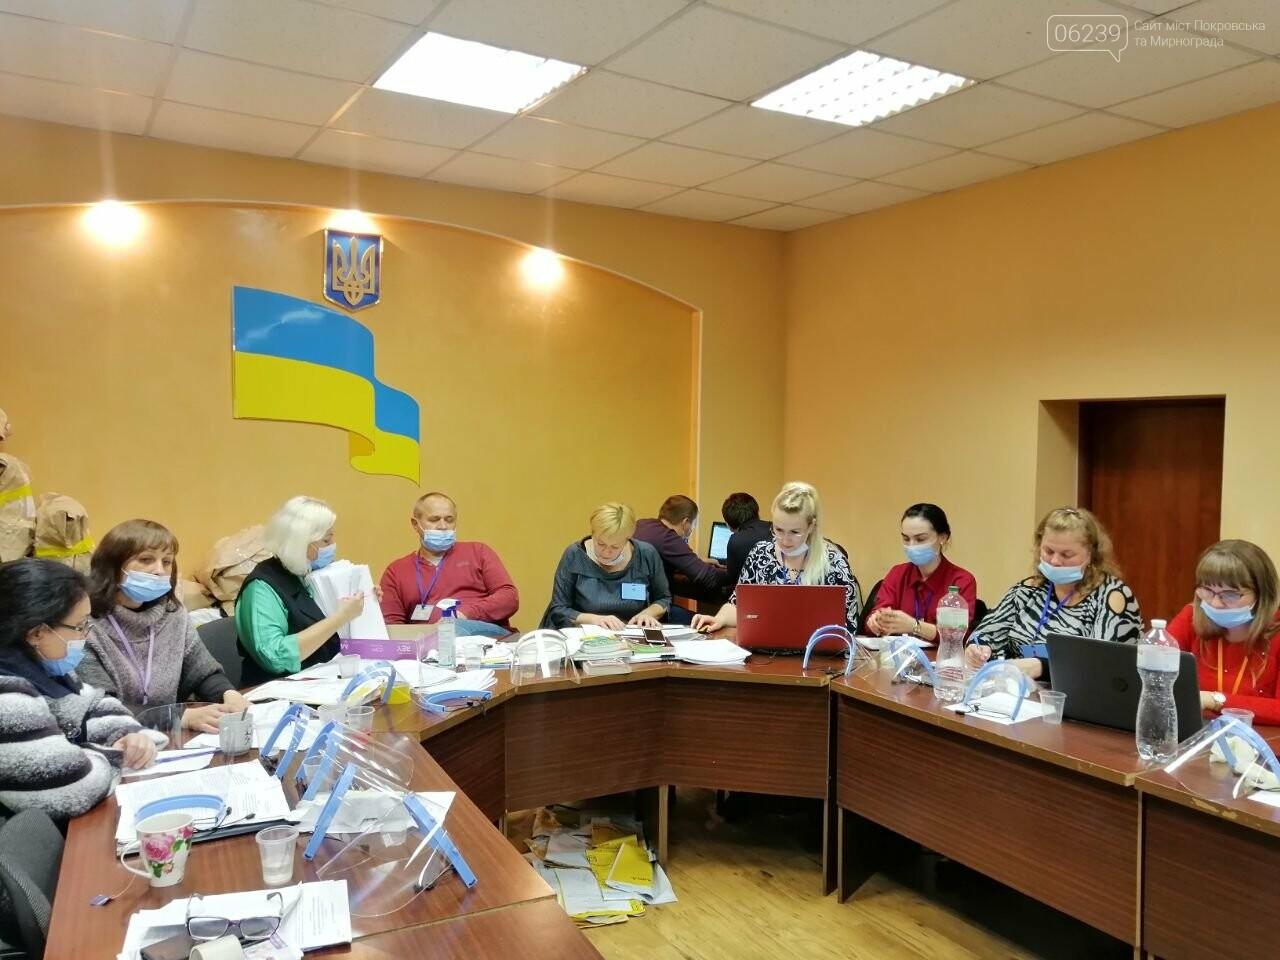 Мирноградская ТИК по состоянию на 18.00 получила бюллетени от 15 участков, фото-5